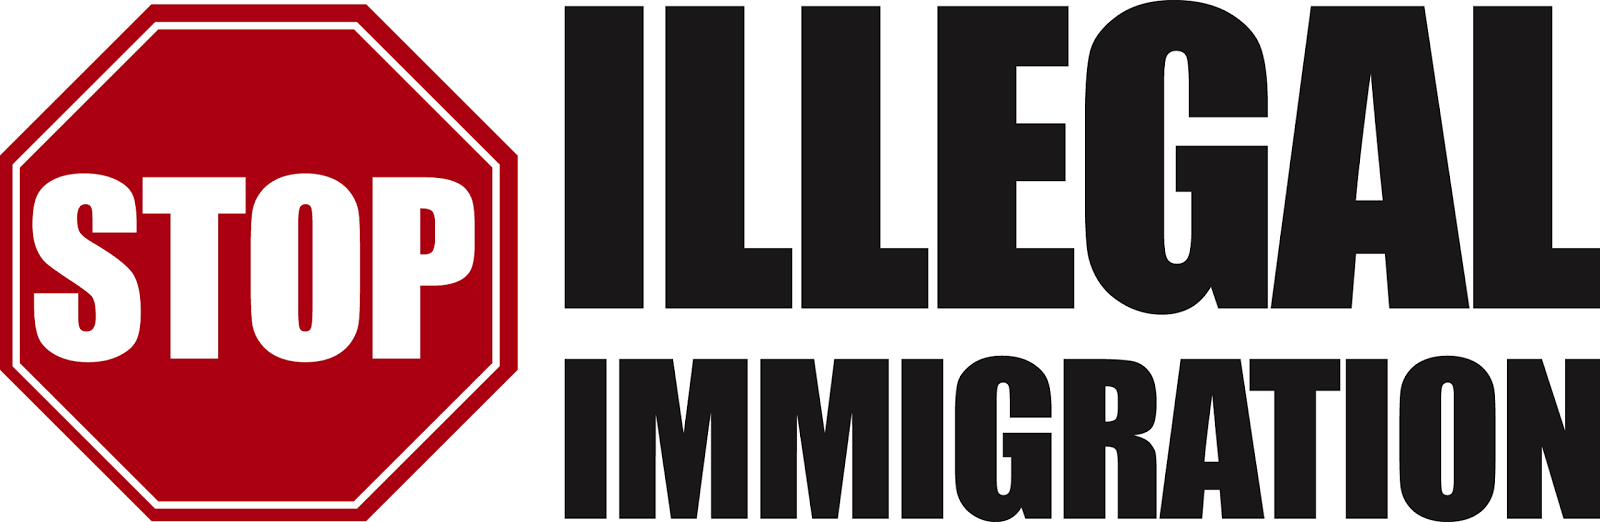 illegal immigration working bibliography Annotated bibliography preface to 'does illegal immigration harm us citizens' illegal immigration ed  illegal immigration david haugen and susan musser .